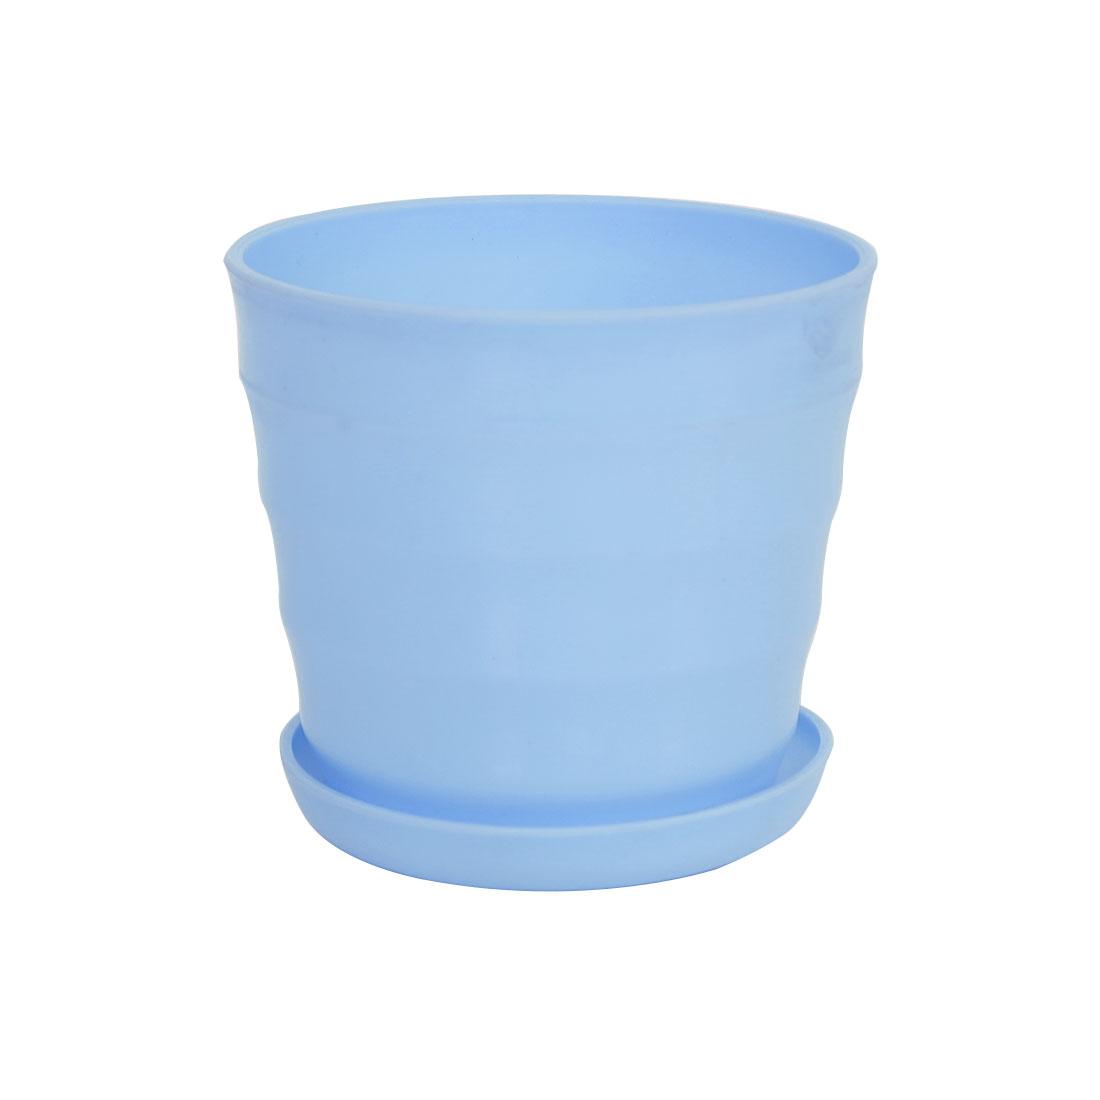 11cm Dia Sky Blue Plastic Stripe Pattern Garden Flower Pot Home Office Decor